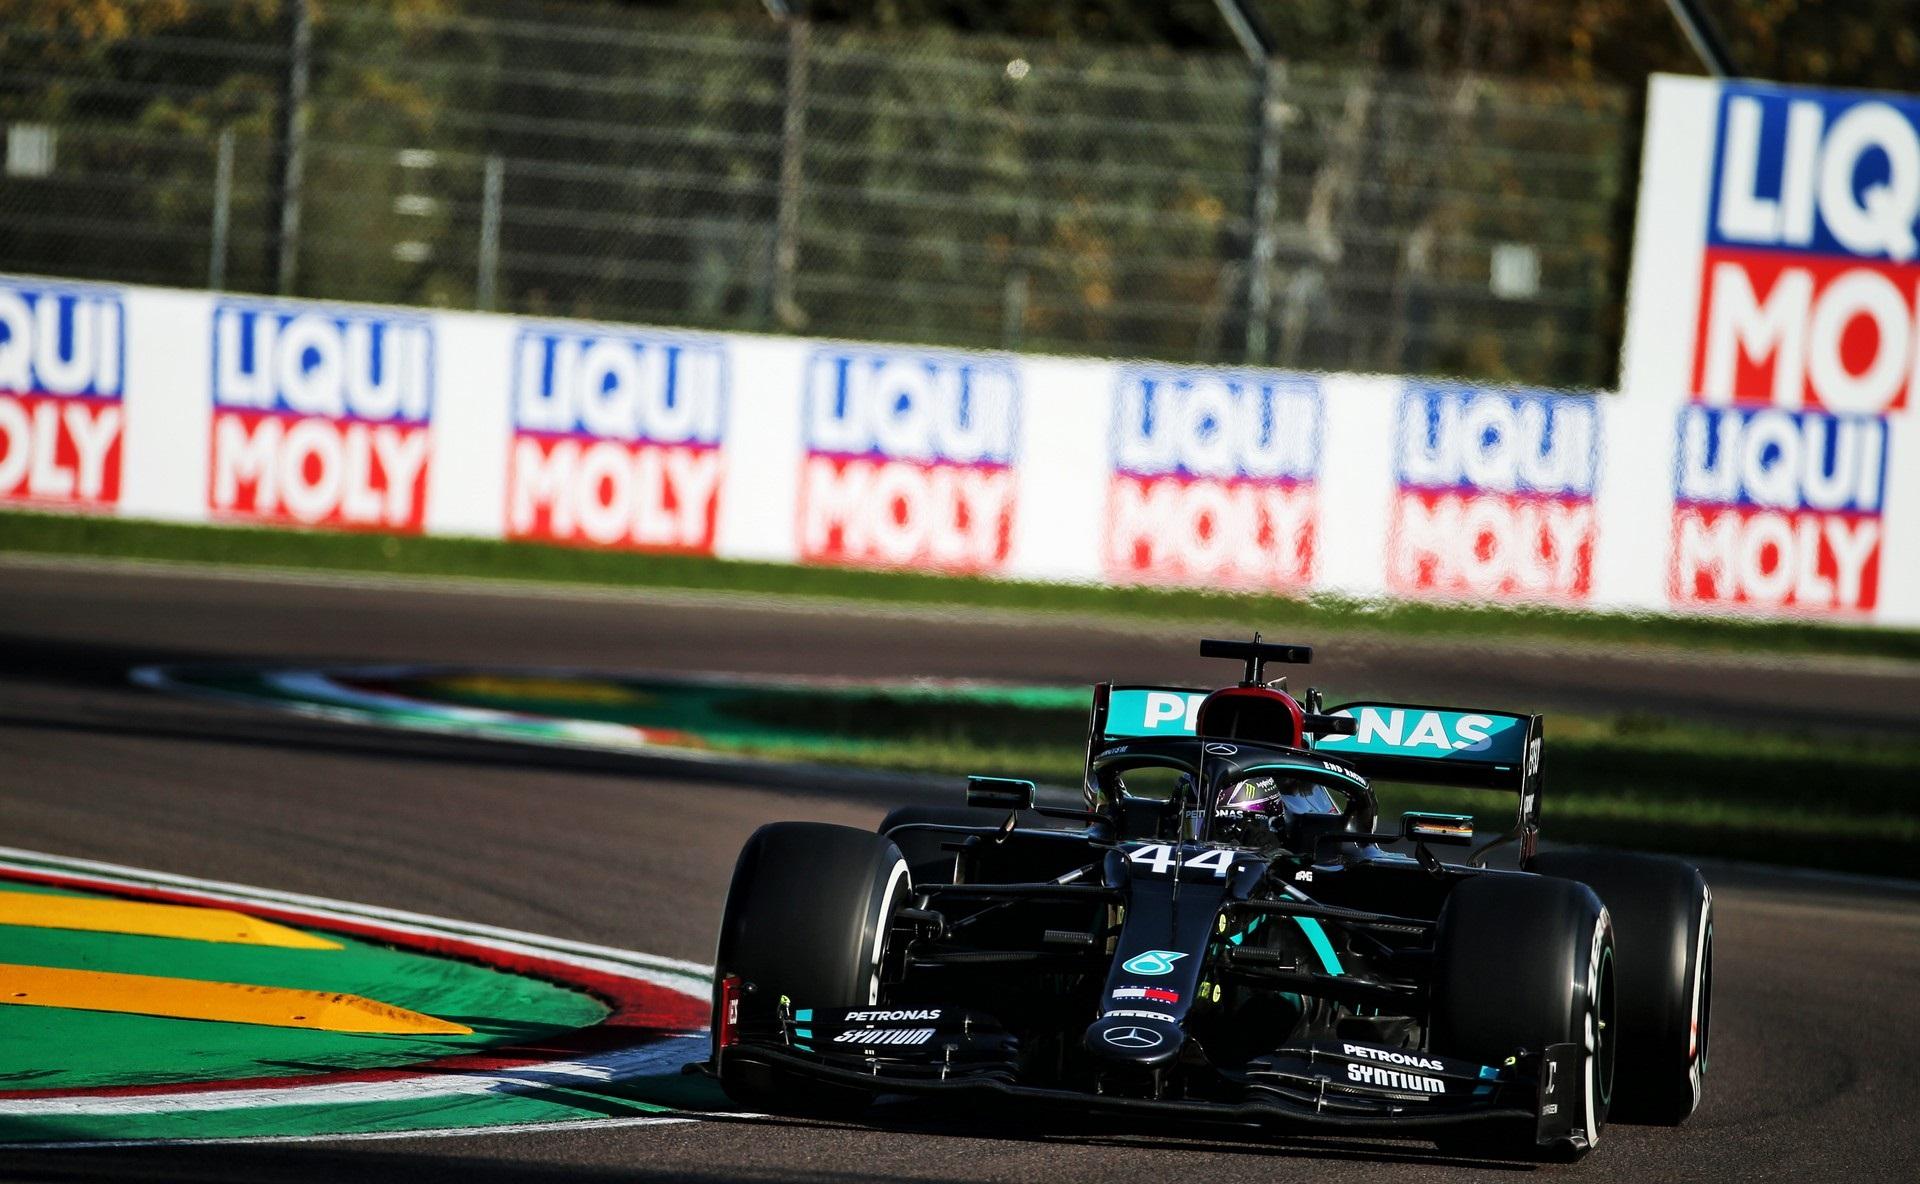 Льюис Хэмилтон выиграл Гран-при Эмилии-Романьи 2020 года. Квят – четвертый